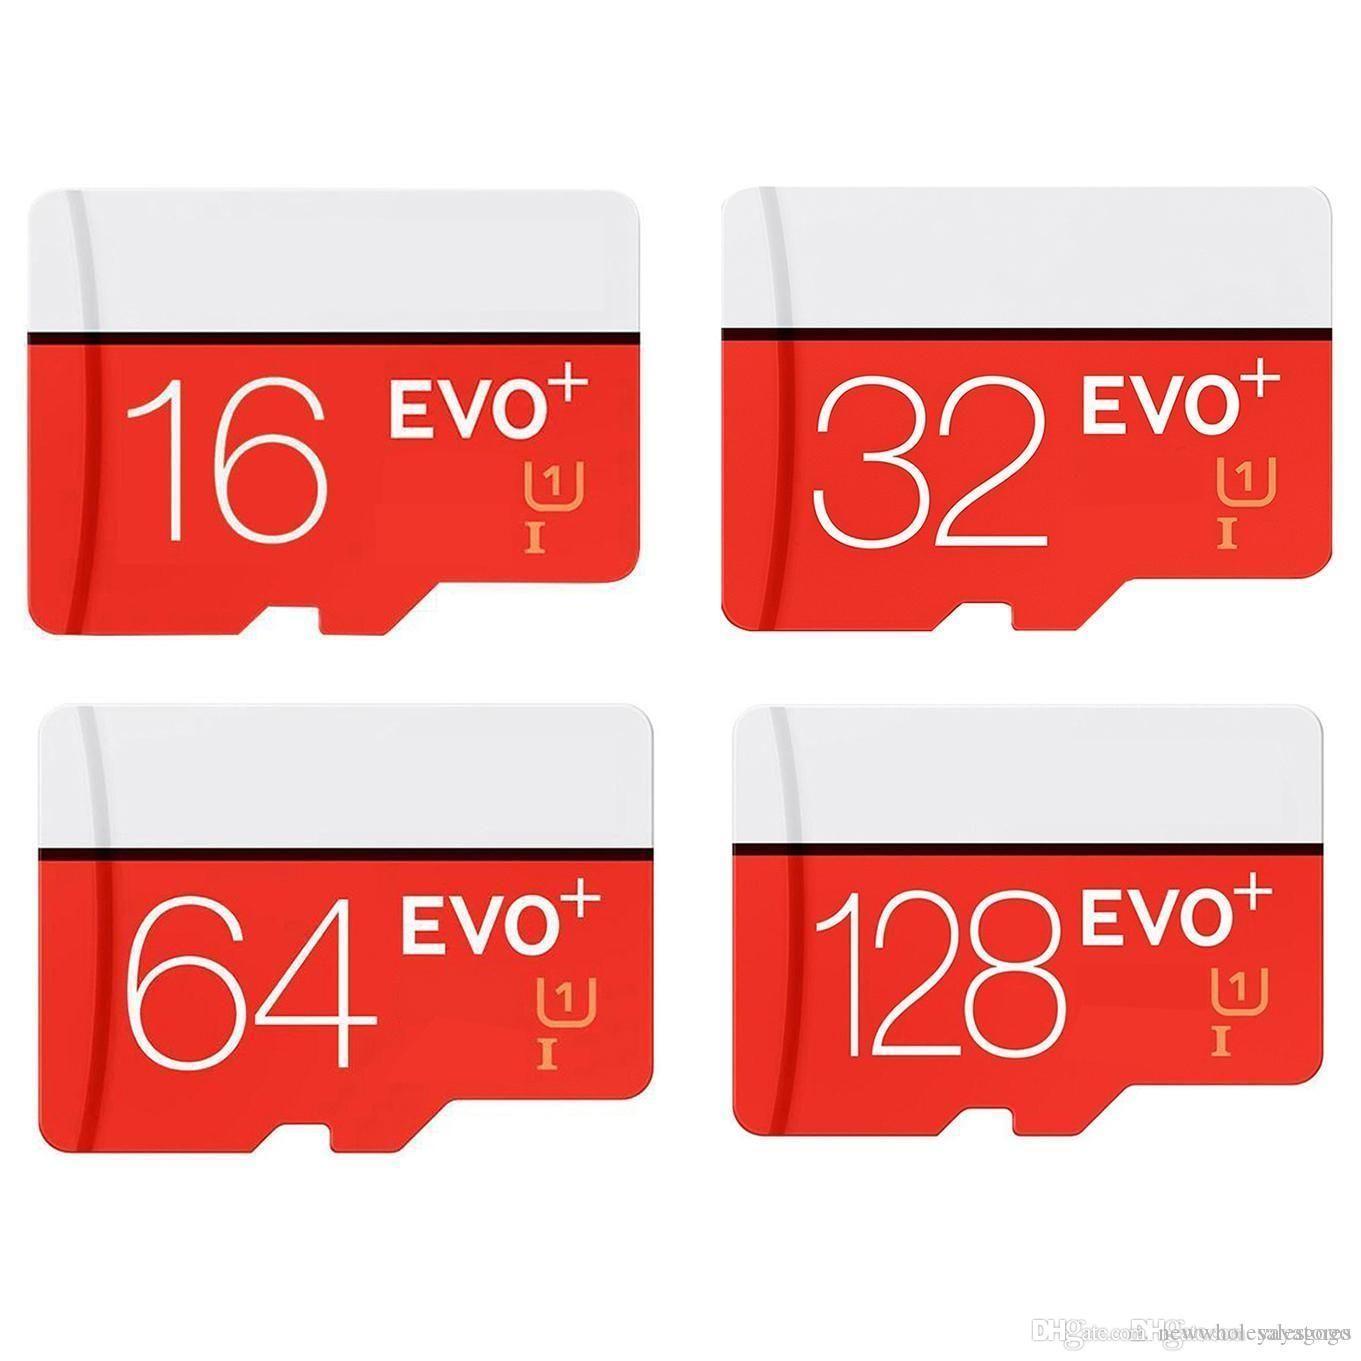 UK Großhandel ECHTE KAPAZITÄT 128 GB 64 GB 32 GB 16 GB EVO PLUS EVO + Micro SD TF Flash-Karte 90 MB / s 80 MB / s U1 U3 Hochgeschwindigkeitsklasse 10 U327